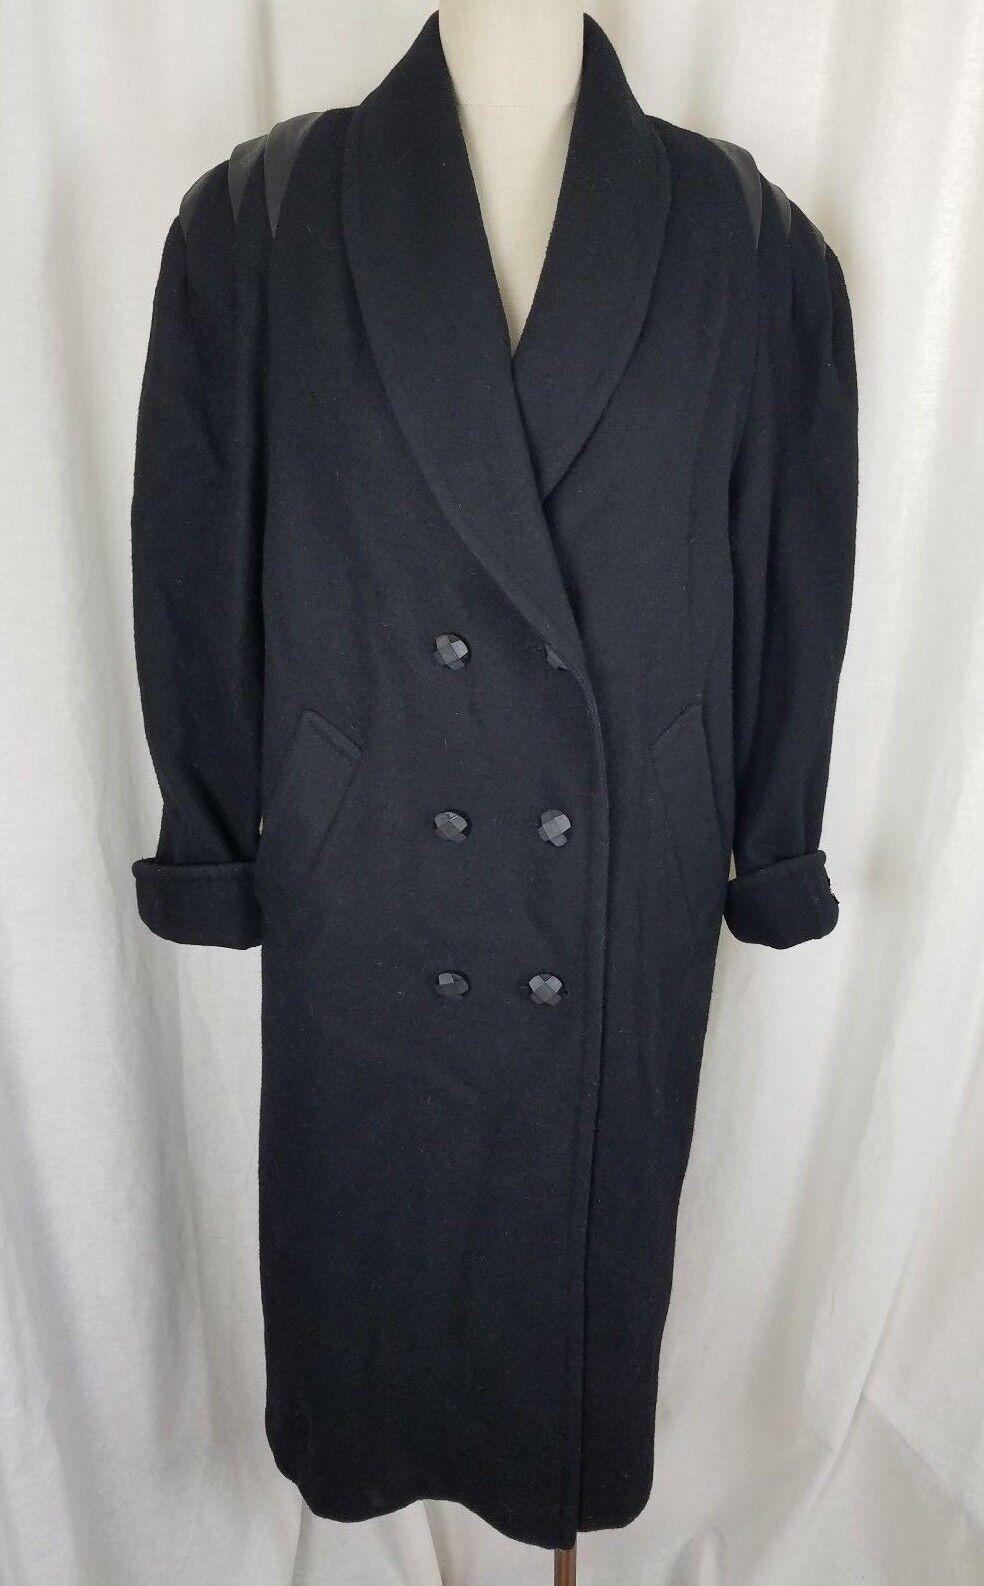 Vintage Jofeld Petites Forstman Winter Wool Pea coat Womens 12P Leather Accents